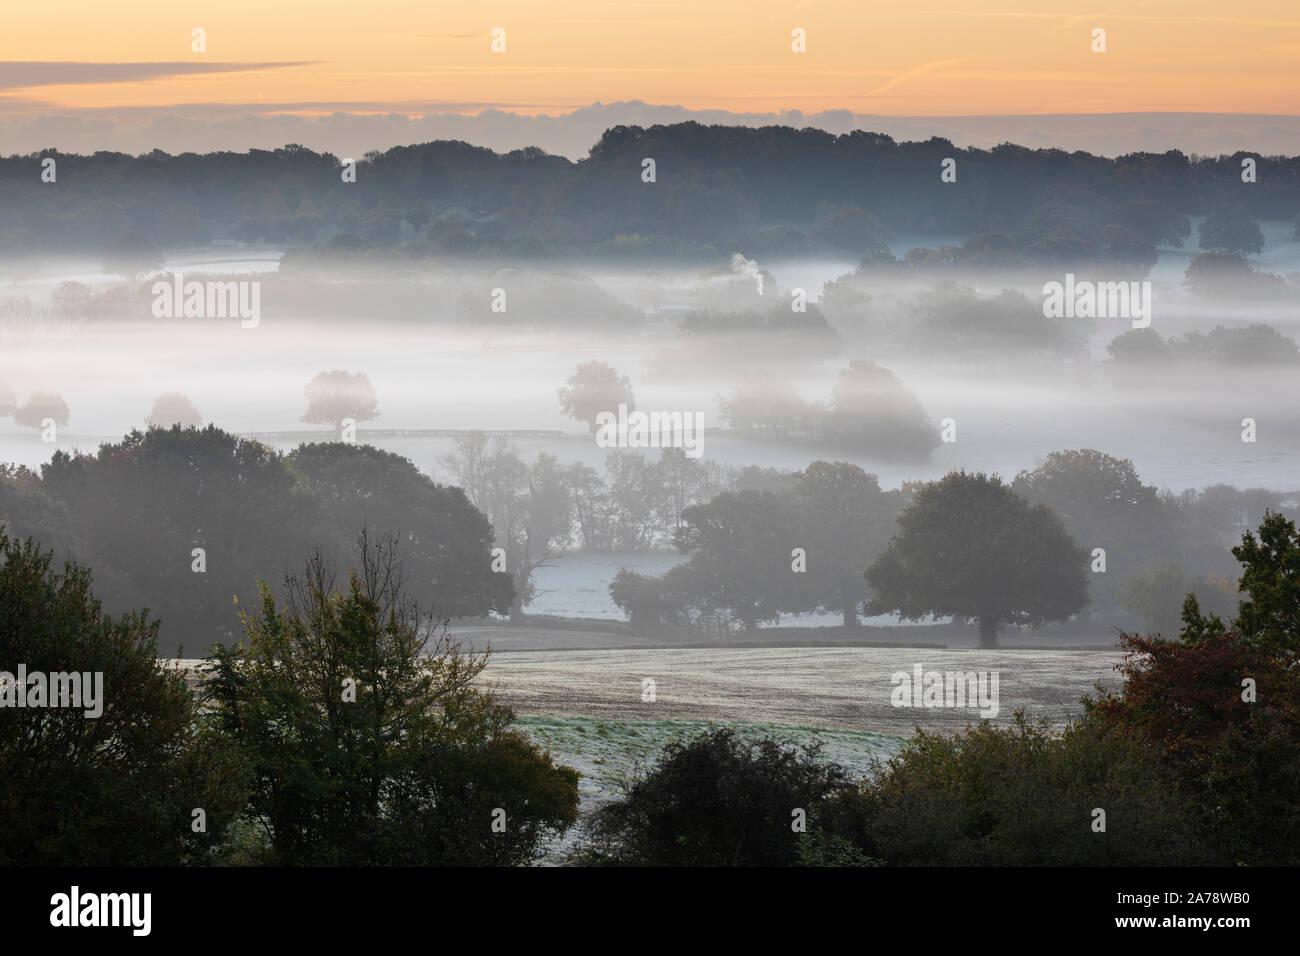 Misty High Weald paisaje al amanecer, Burwash, East Sussex, Inglaterra, Reino Unido, Europa Foto de stock